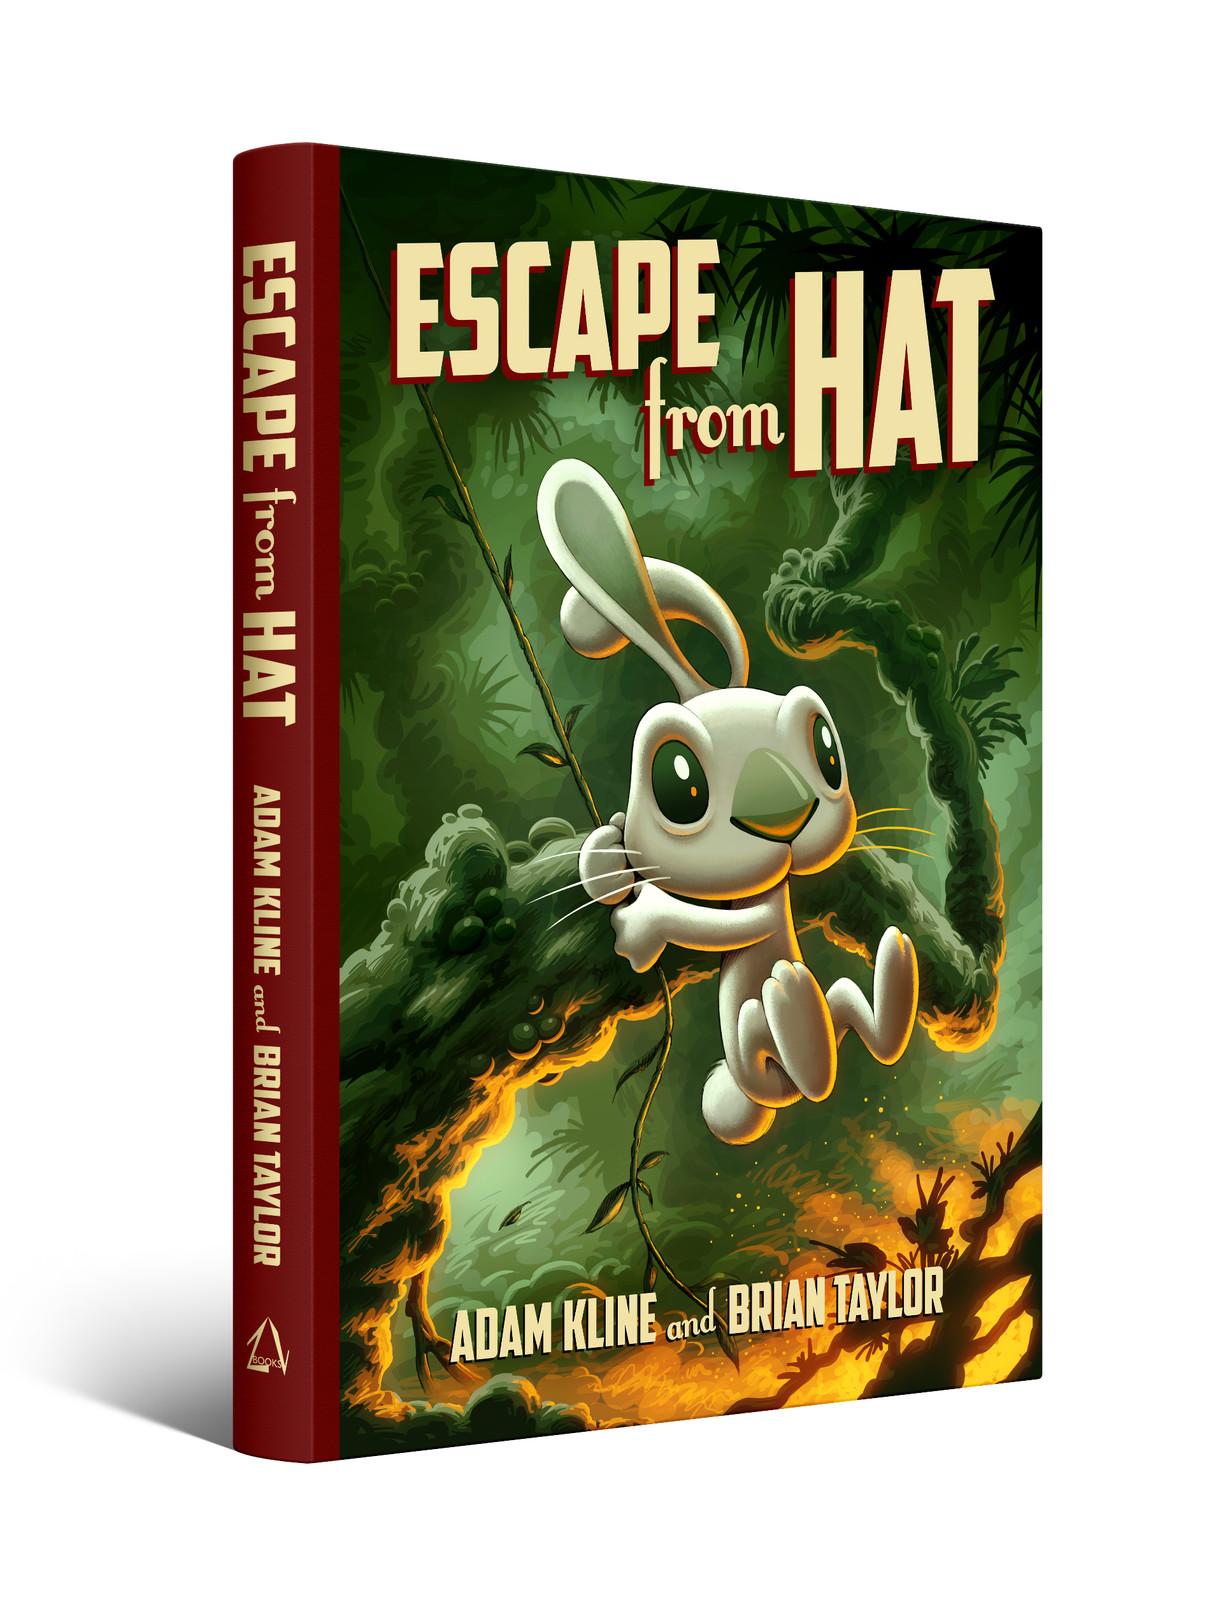 Escape from Hat book cover design